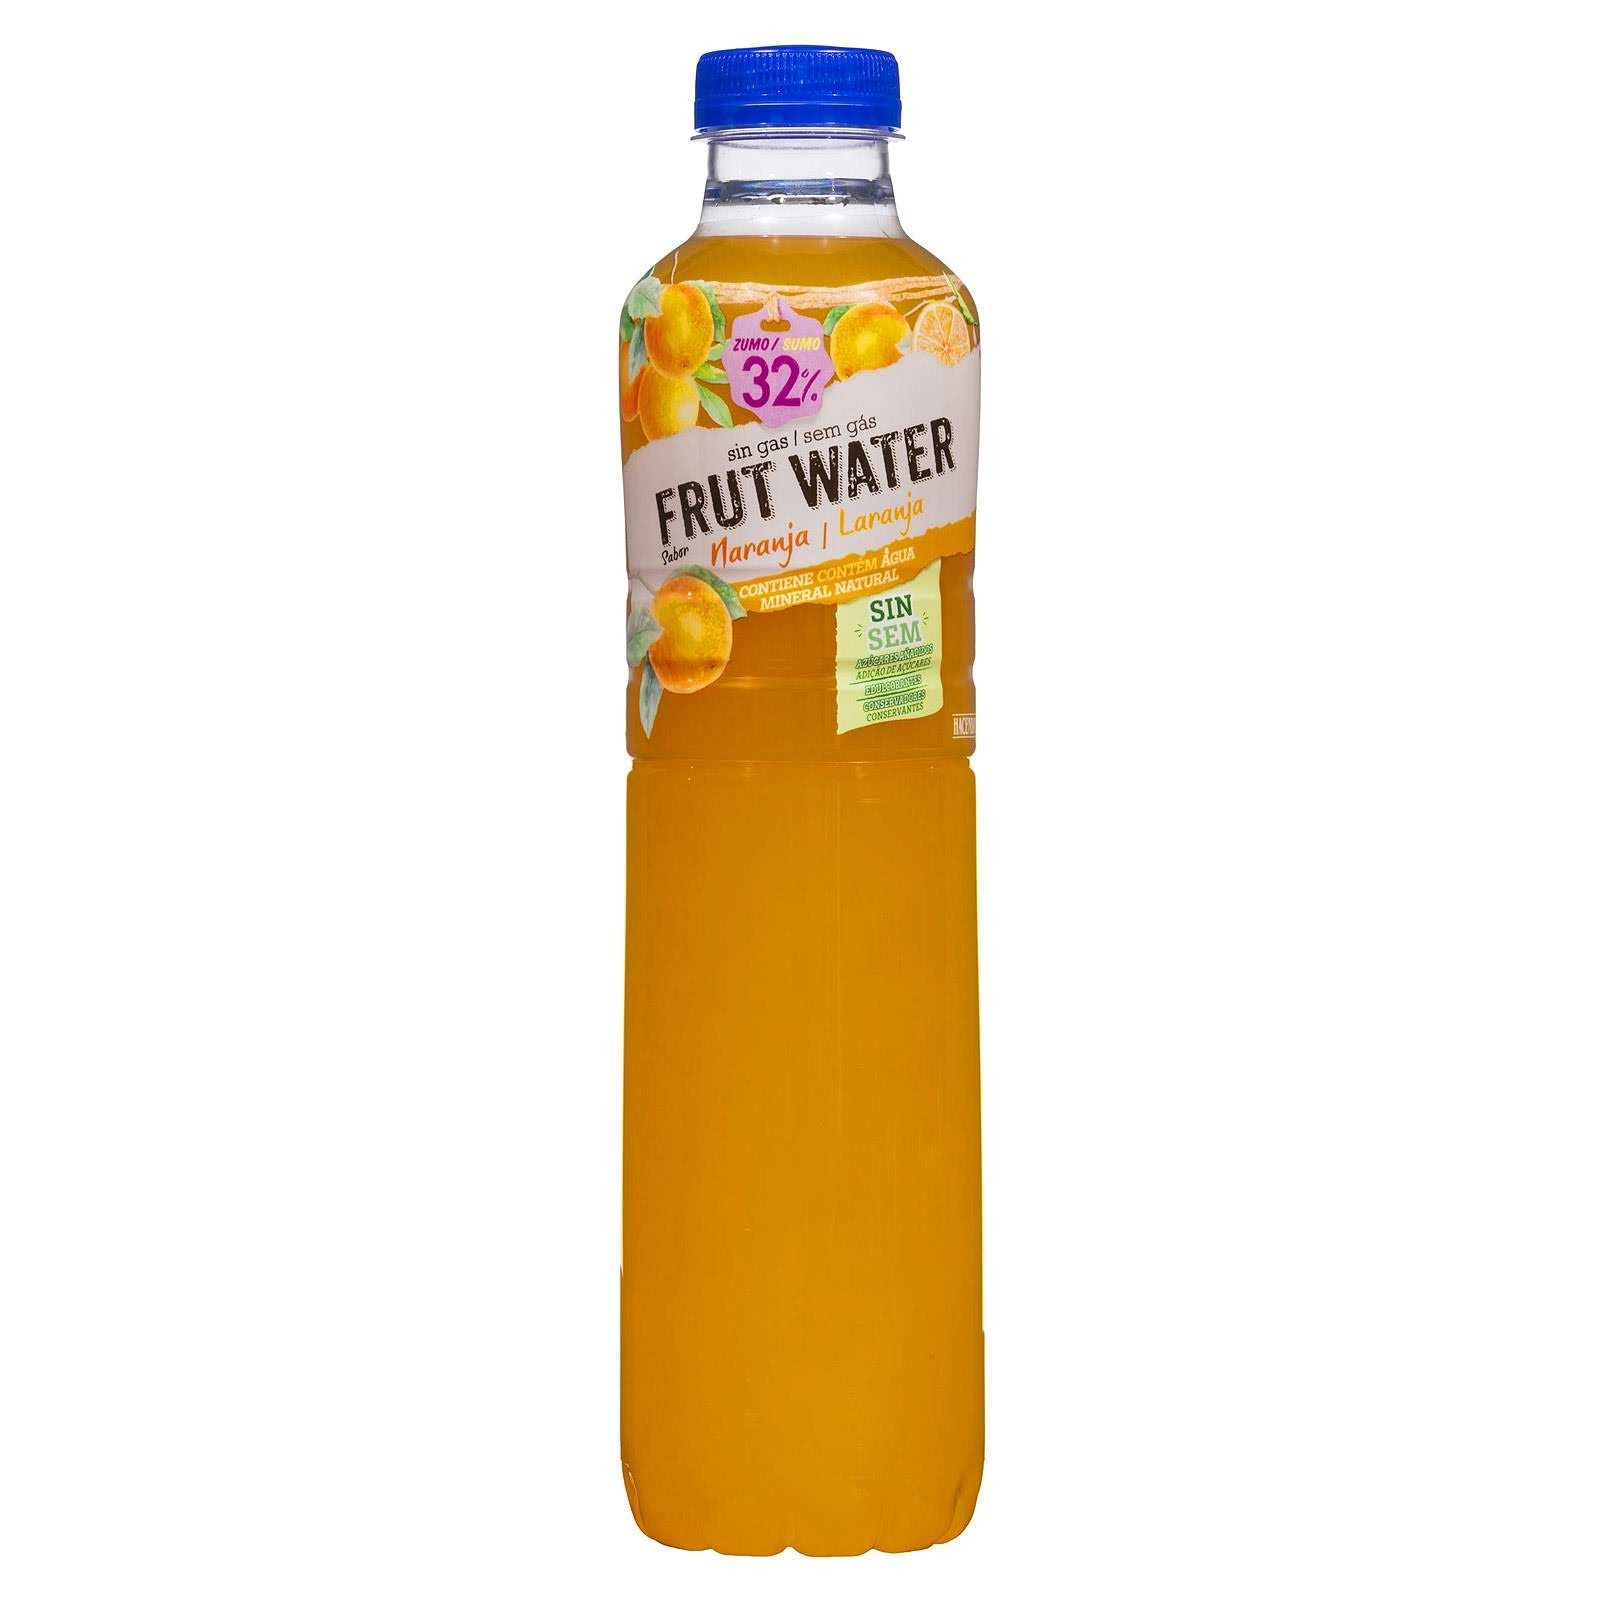 refresco-frut-water-naranja-hacendado-mercadona-1-3128345